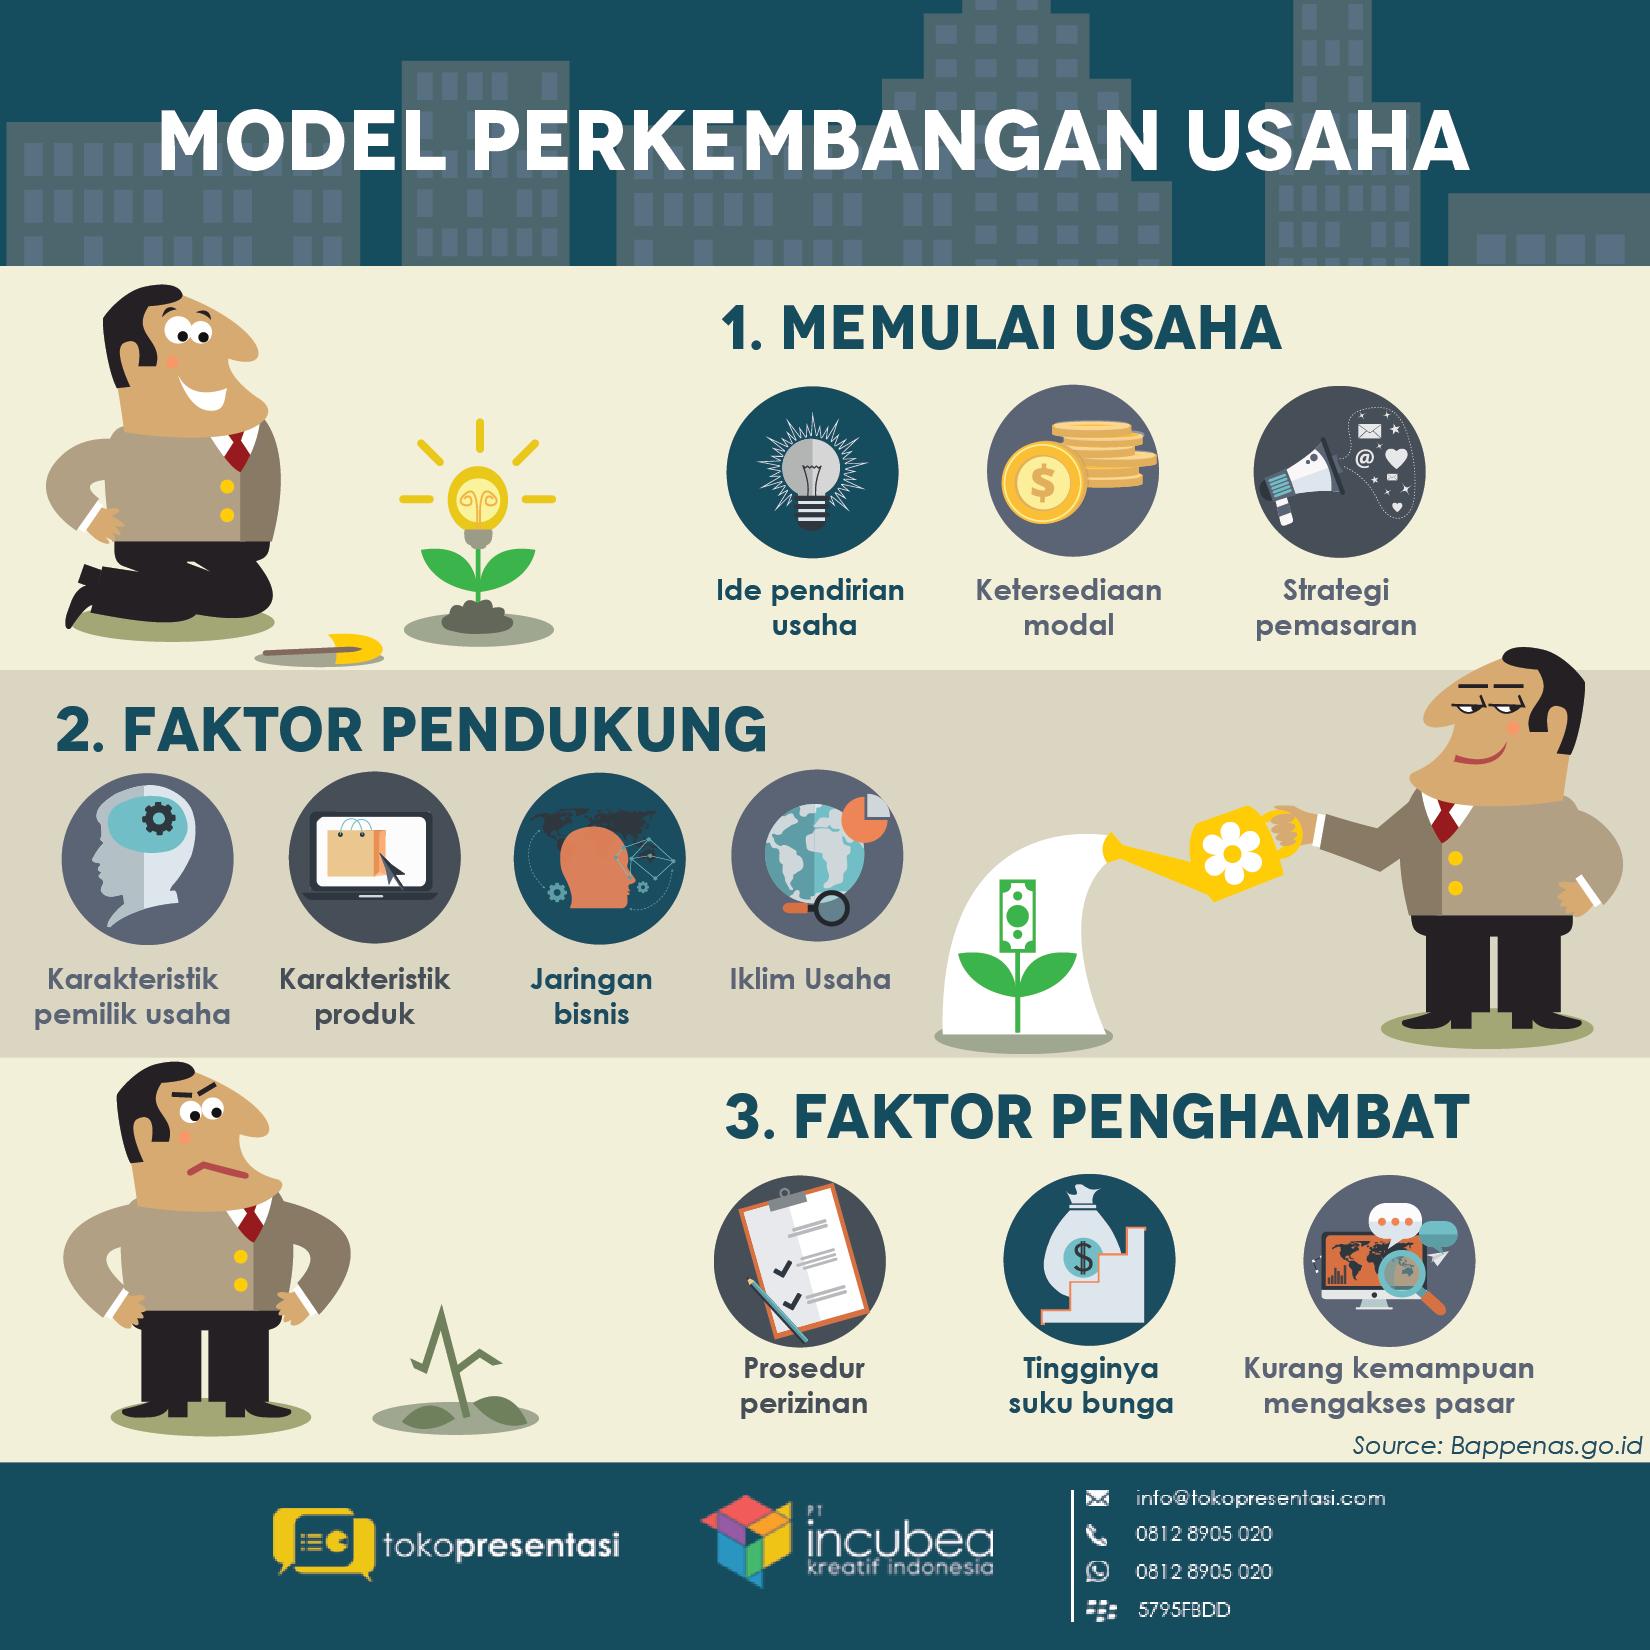 Infografis model perkembangan usaha umkm tokopresentasi